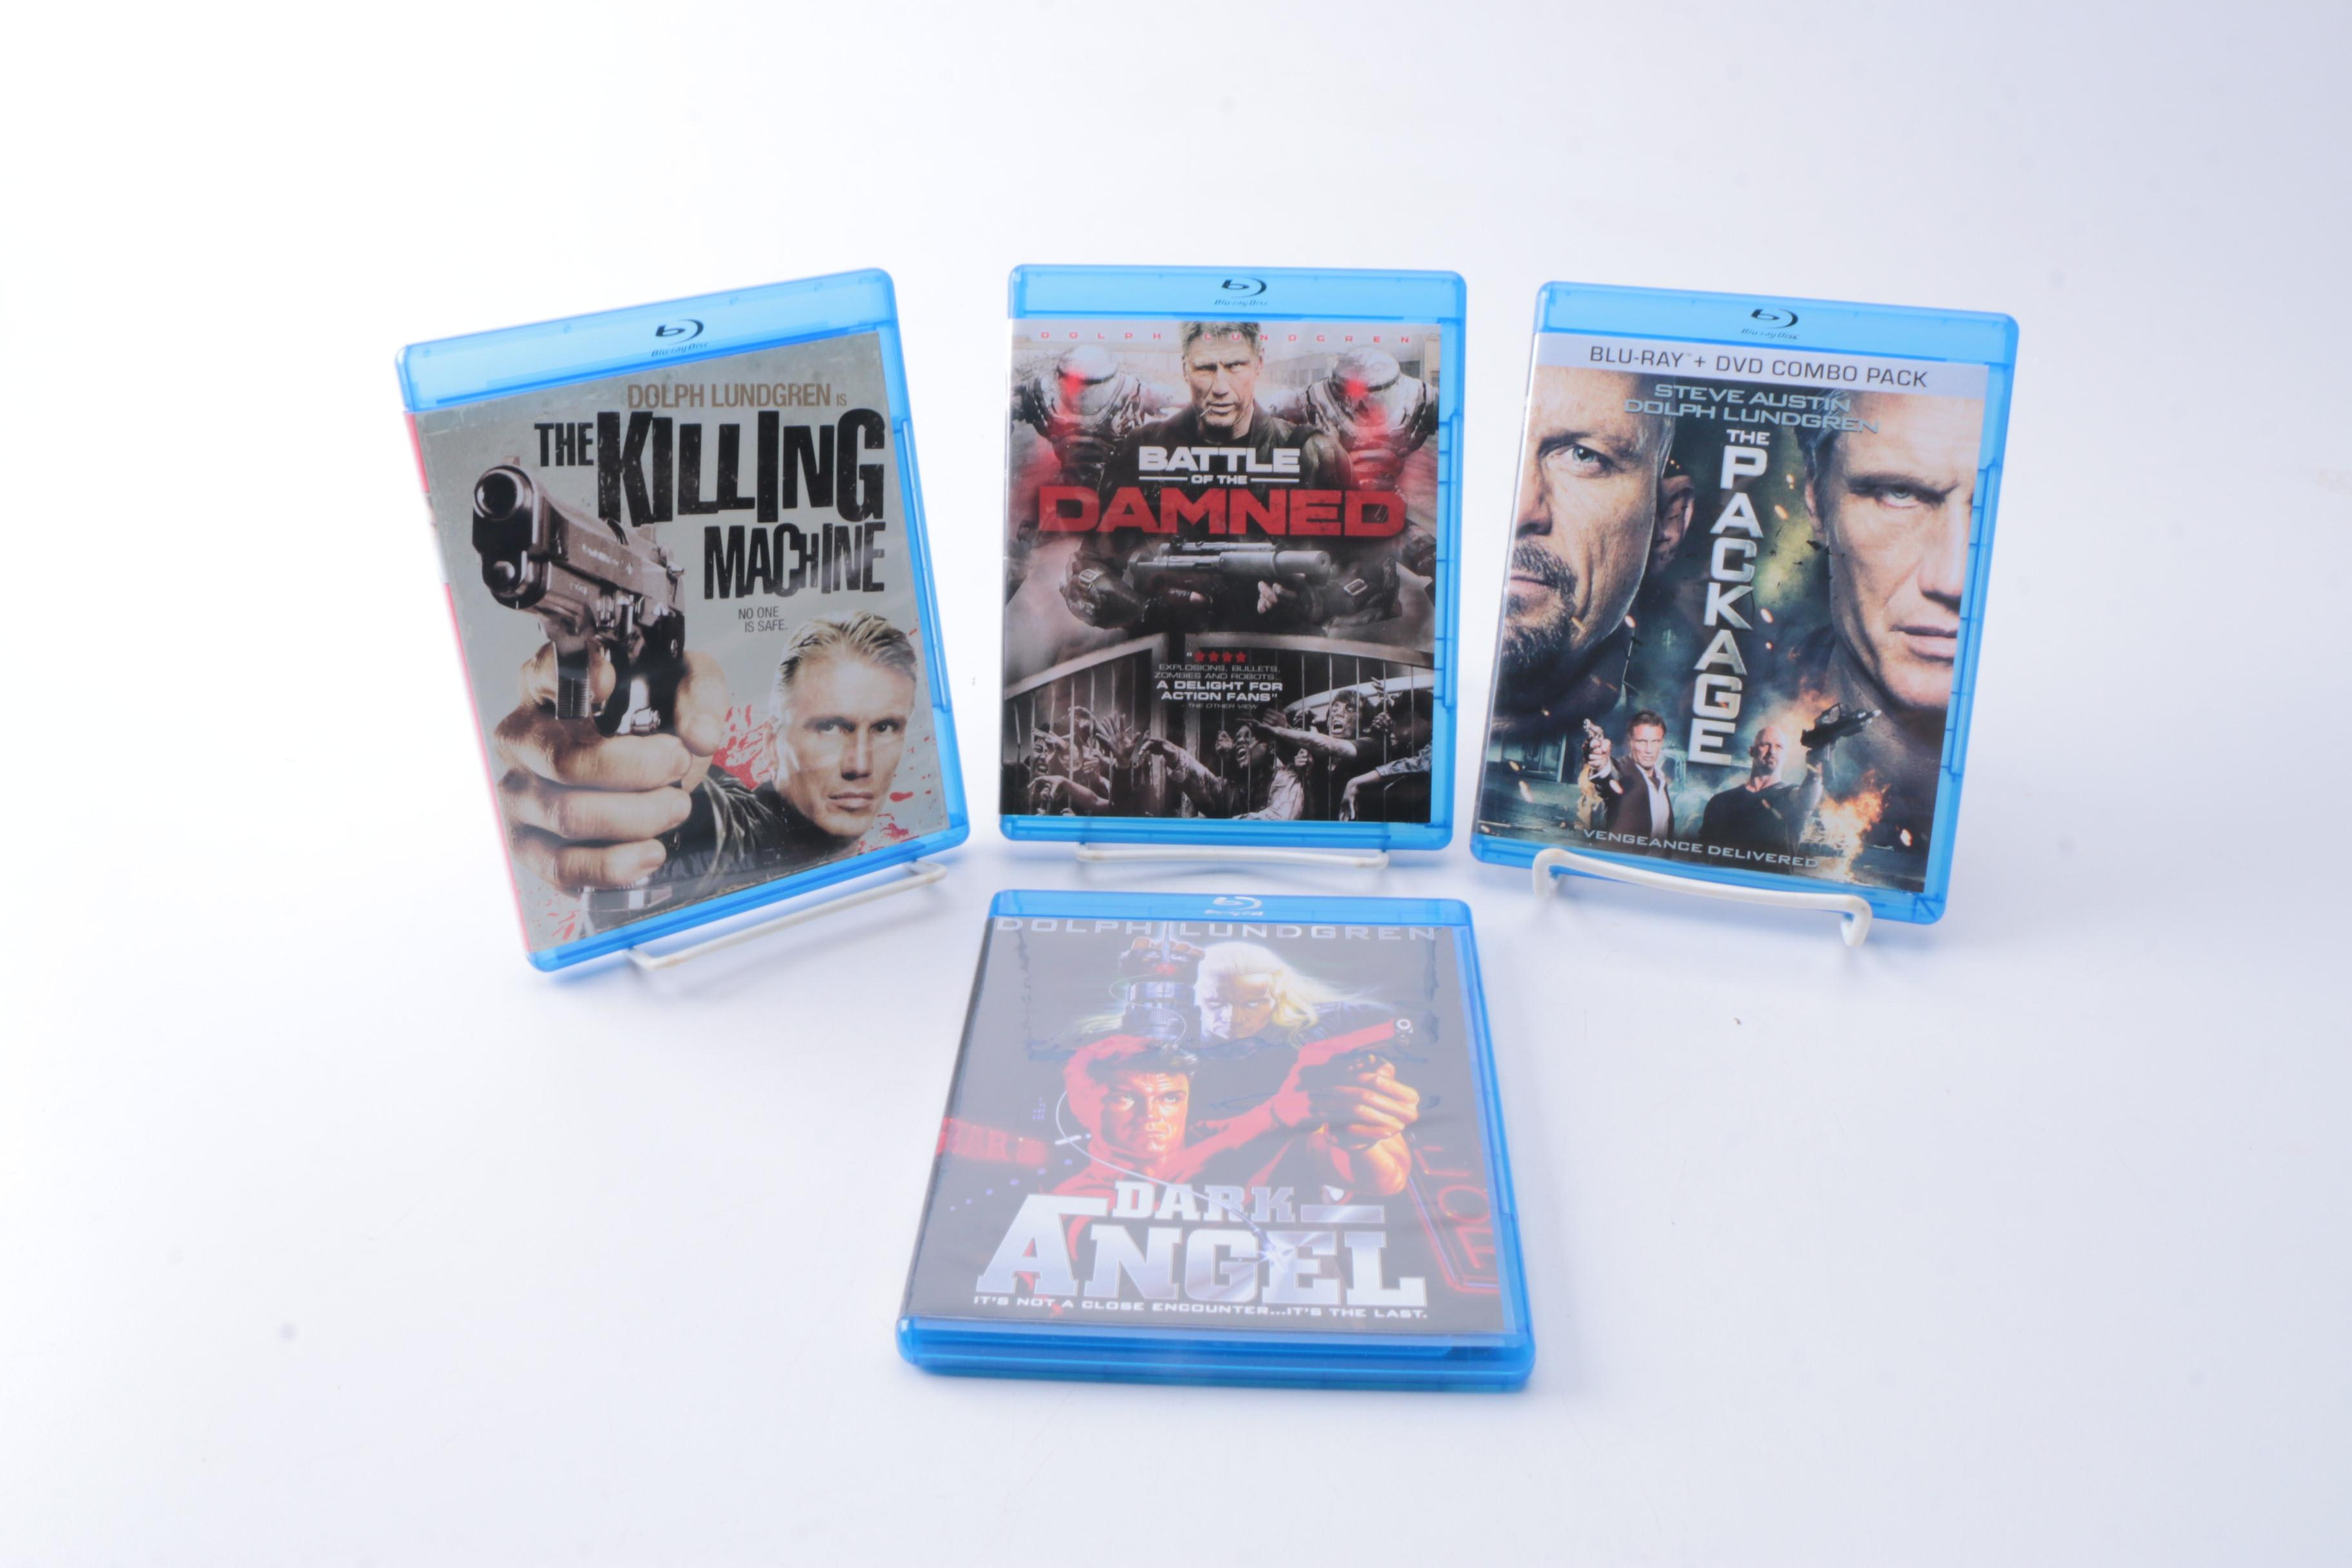 Dolph Lundgren Films On Blu-ray Discs